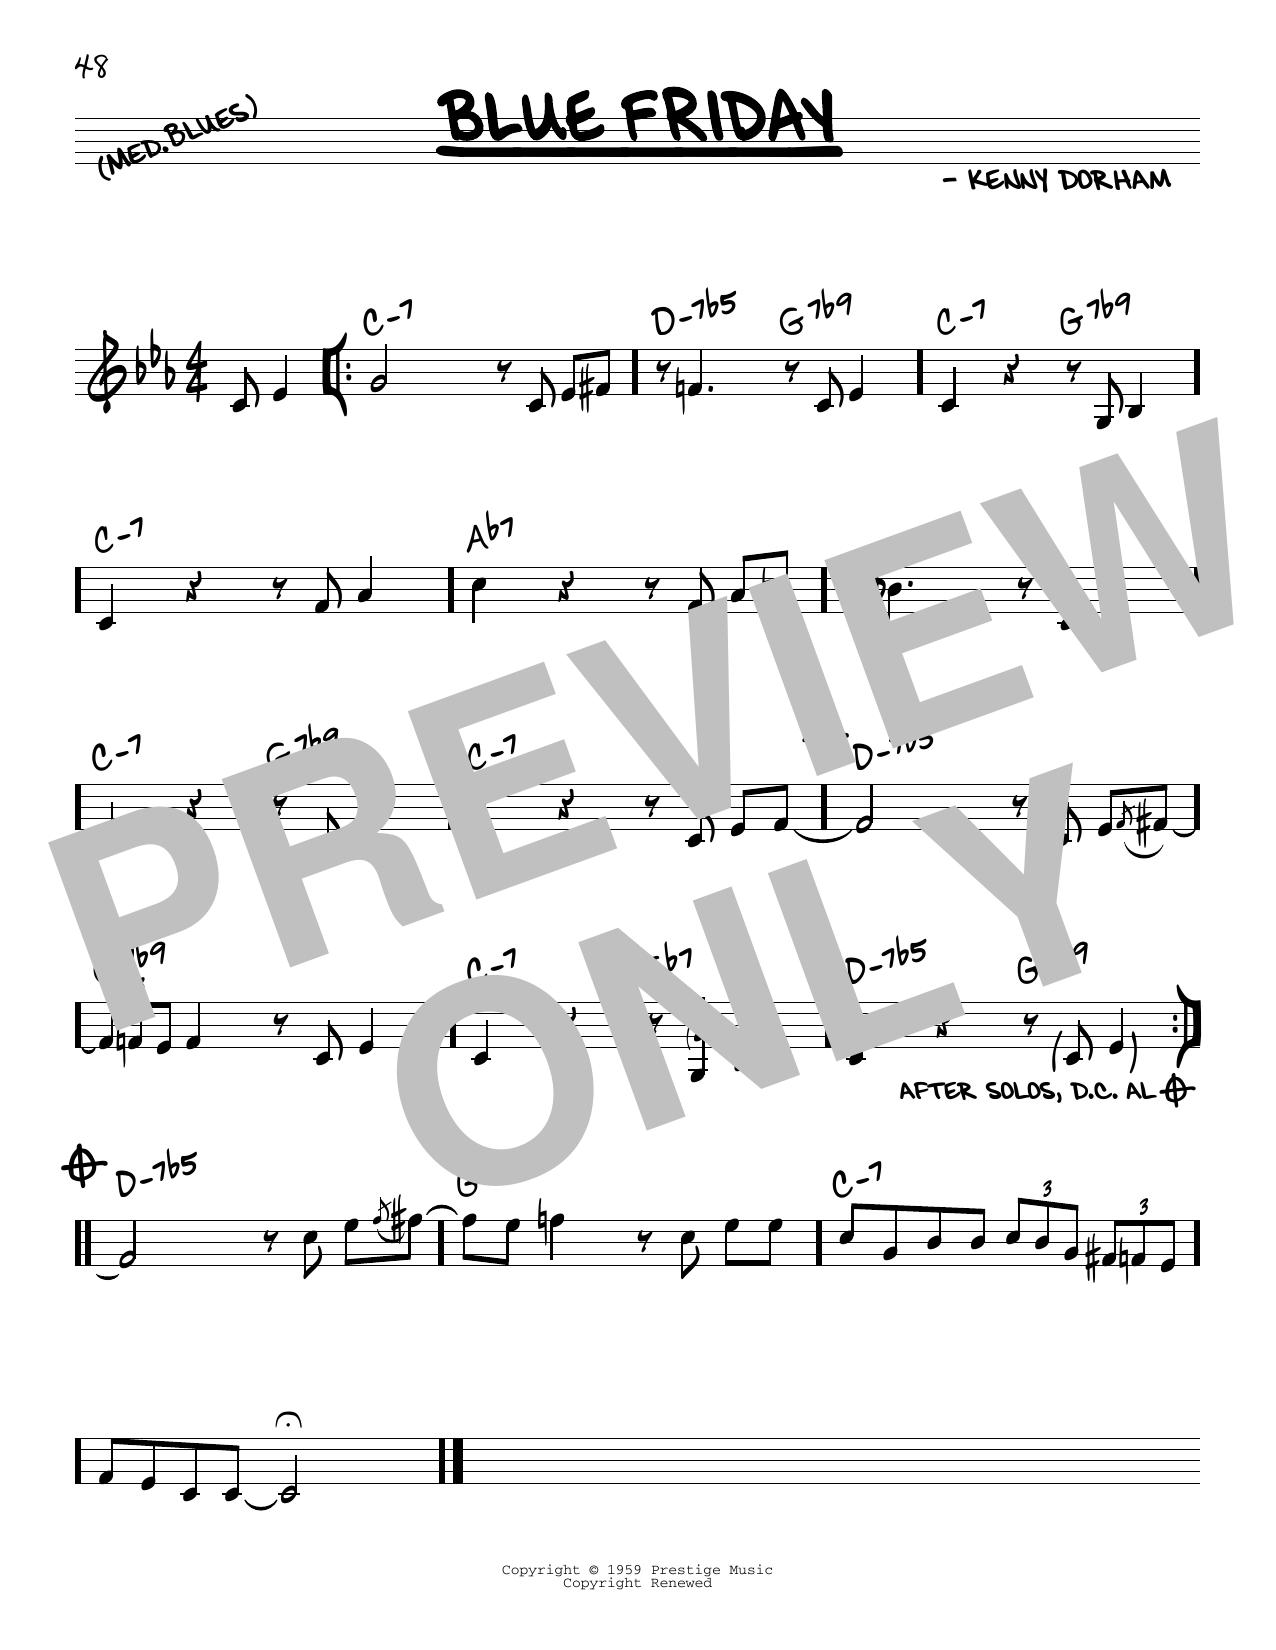 Kenny Dorham Blue Friday sheet music notes and chords. Download Printable PDF.